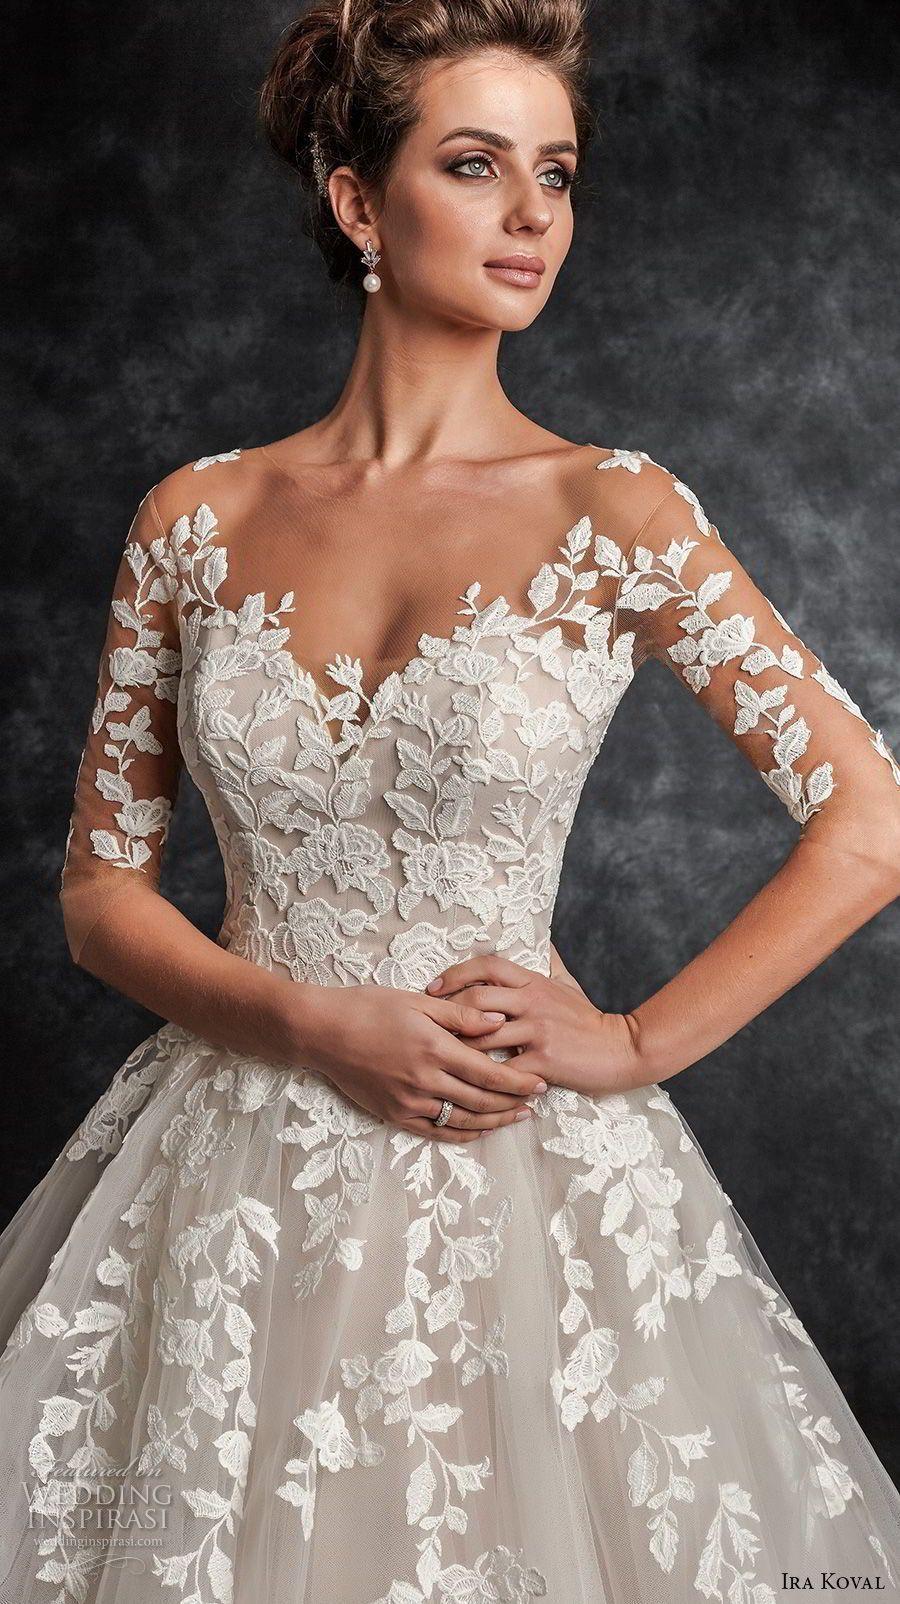 Ira koval bridal half sleeves sweetheart neckline heavily